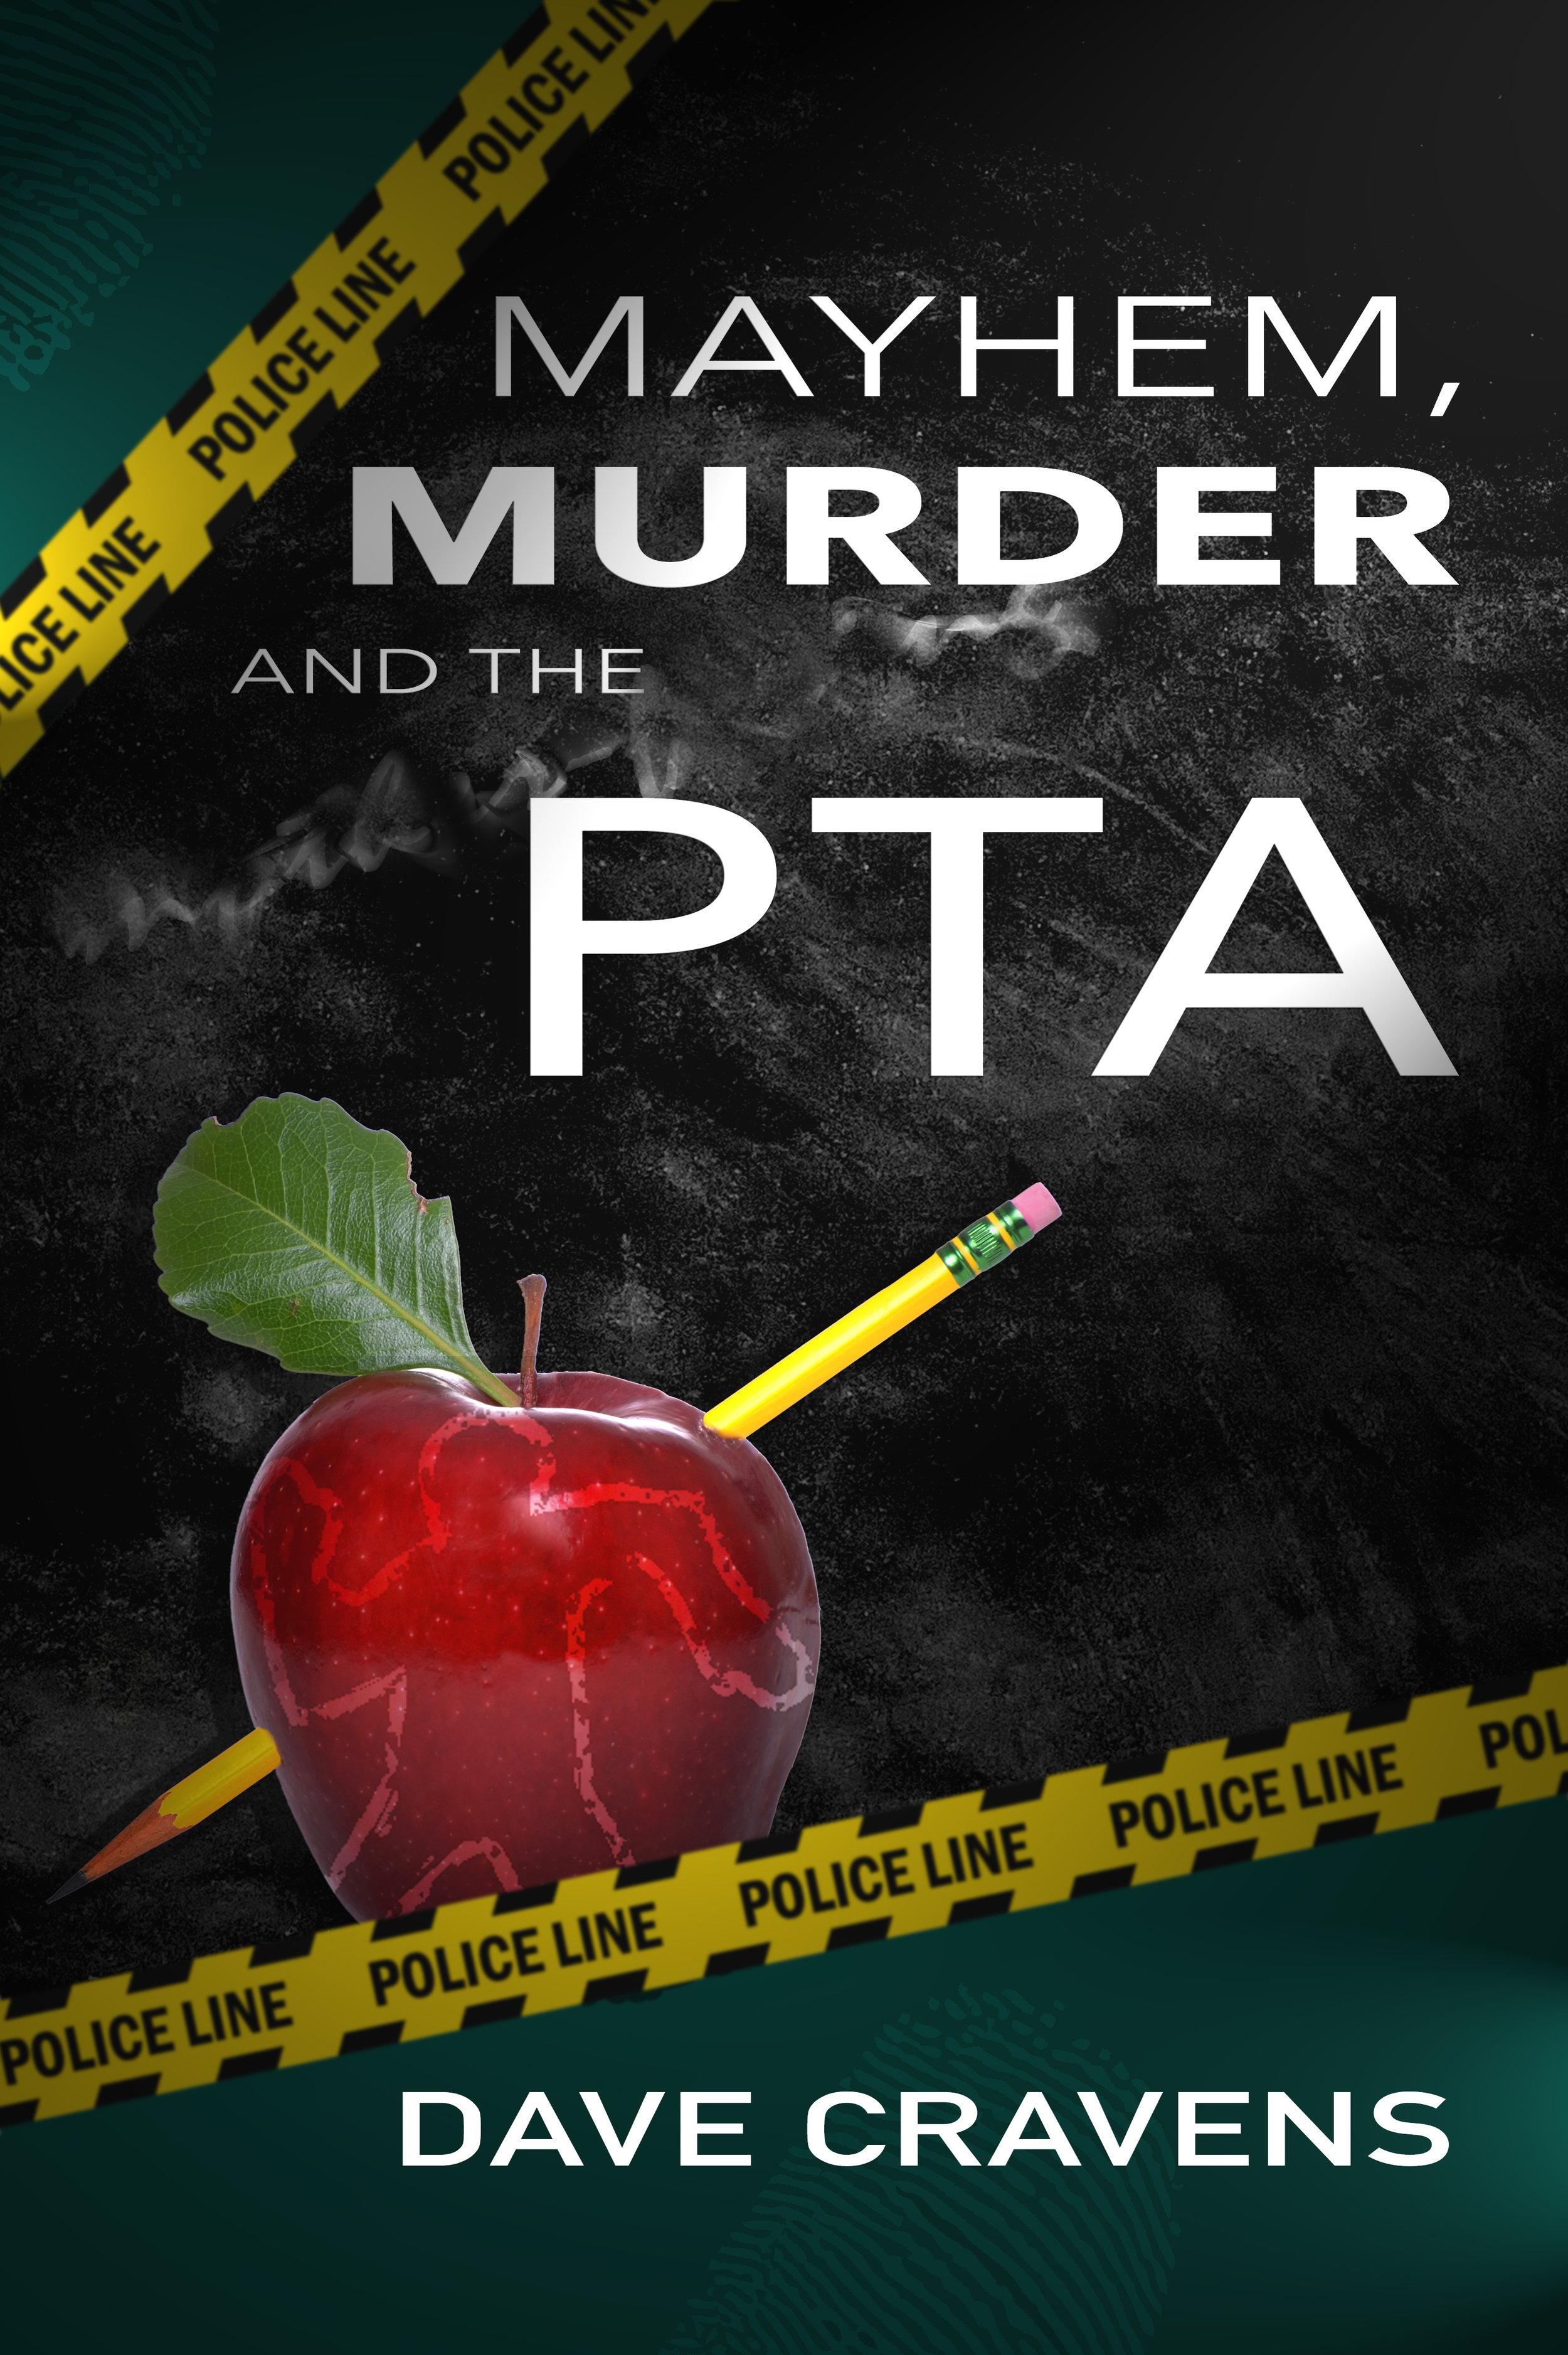 MurderinthePTA05_PrintA_B.jpg